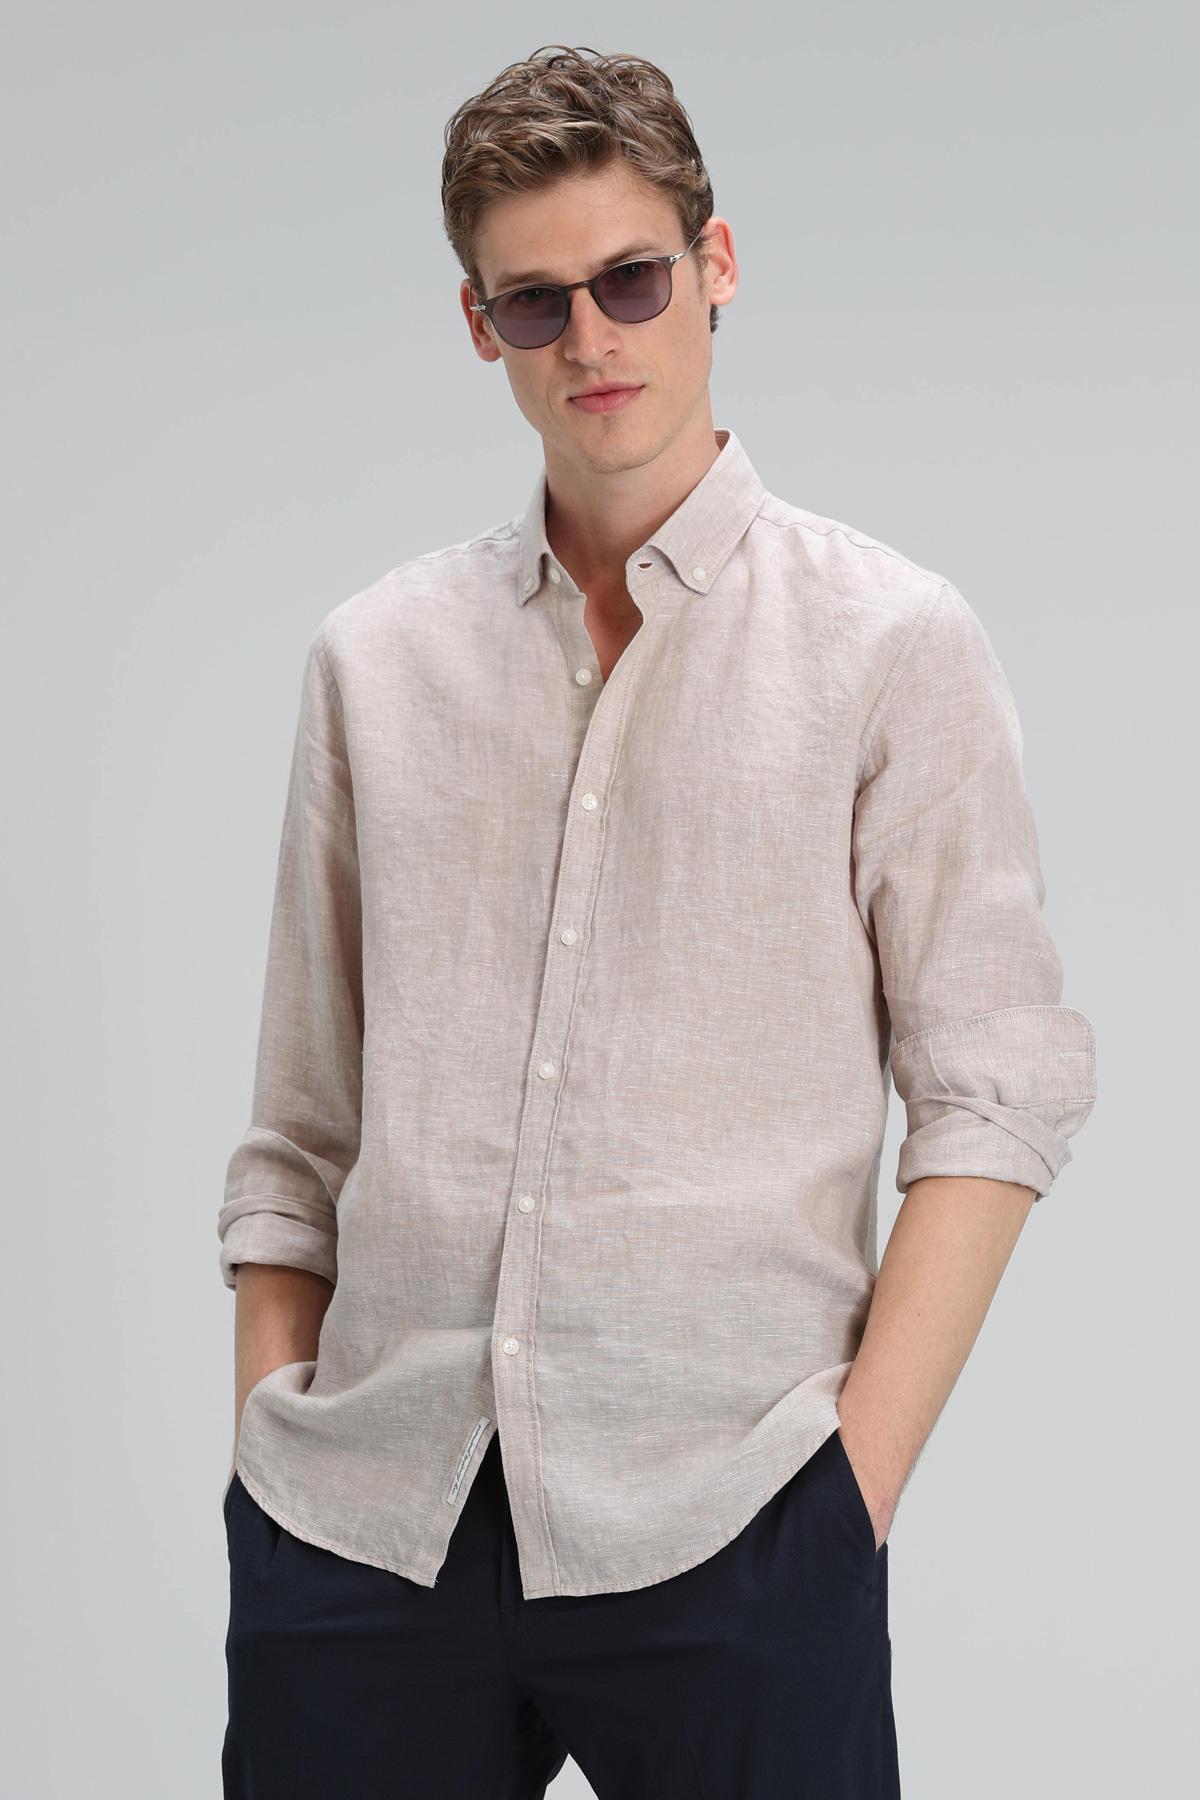 Pitaya Erkek Keten Gömlek Comfort Fit Bej